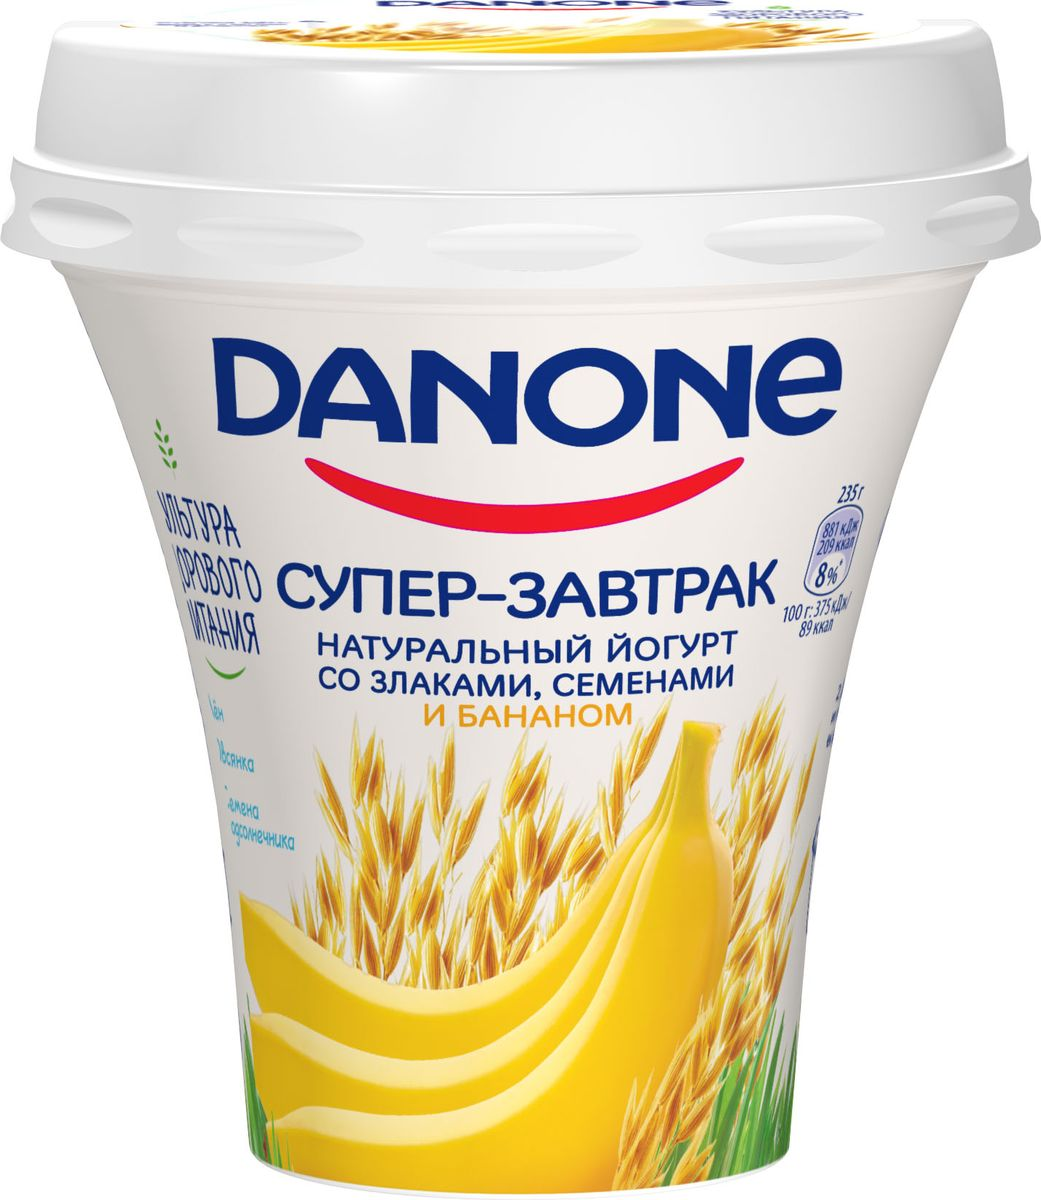 Danone Супер-завтрак Йогурт питьевой Злаки, Семена И Банан 2,6%, 235 г danone йогурт питьевой черника ежевика 2 1% 270 г